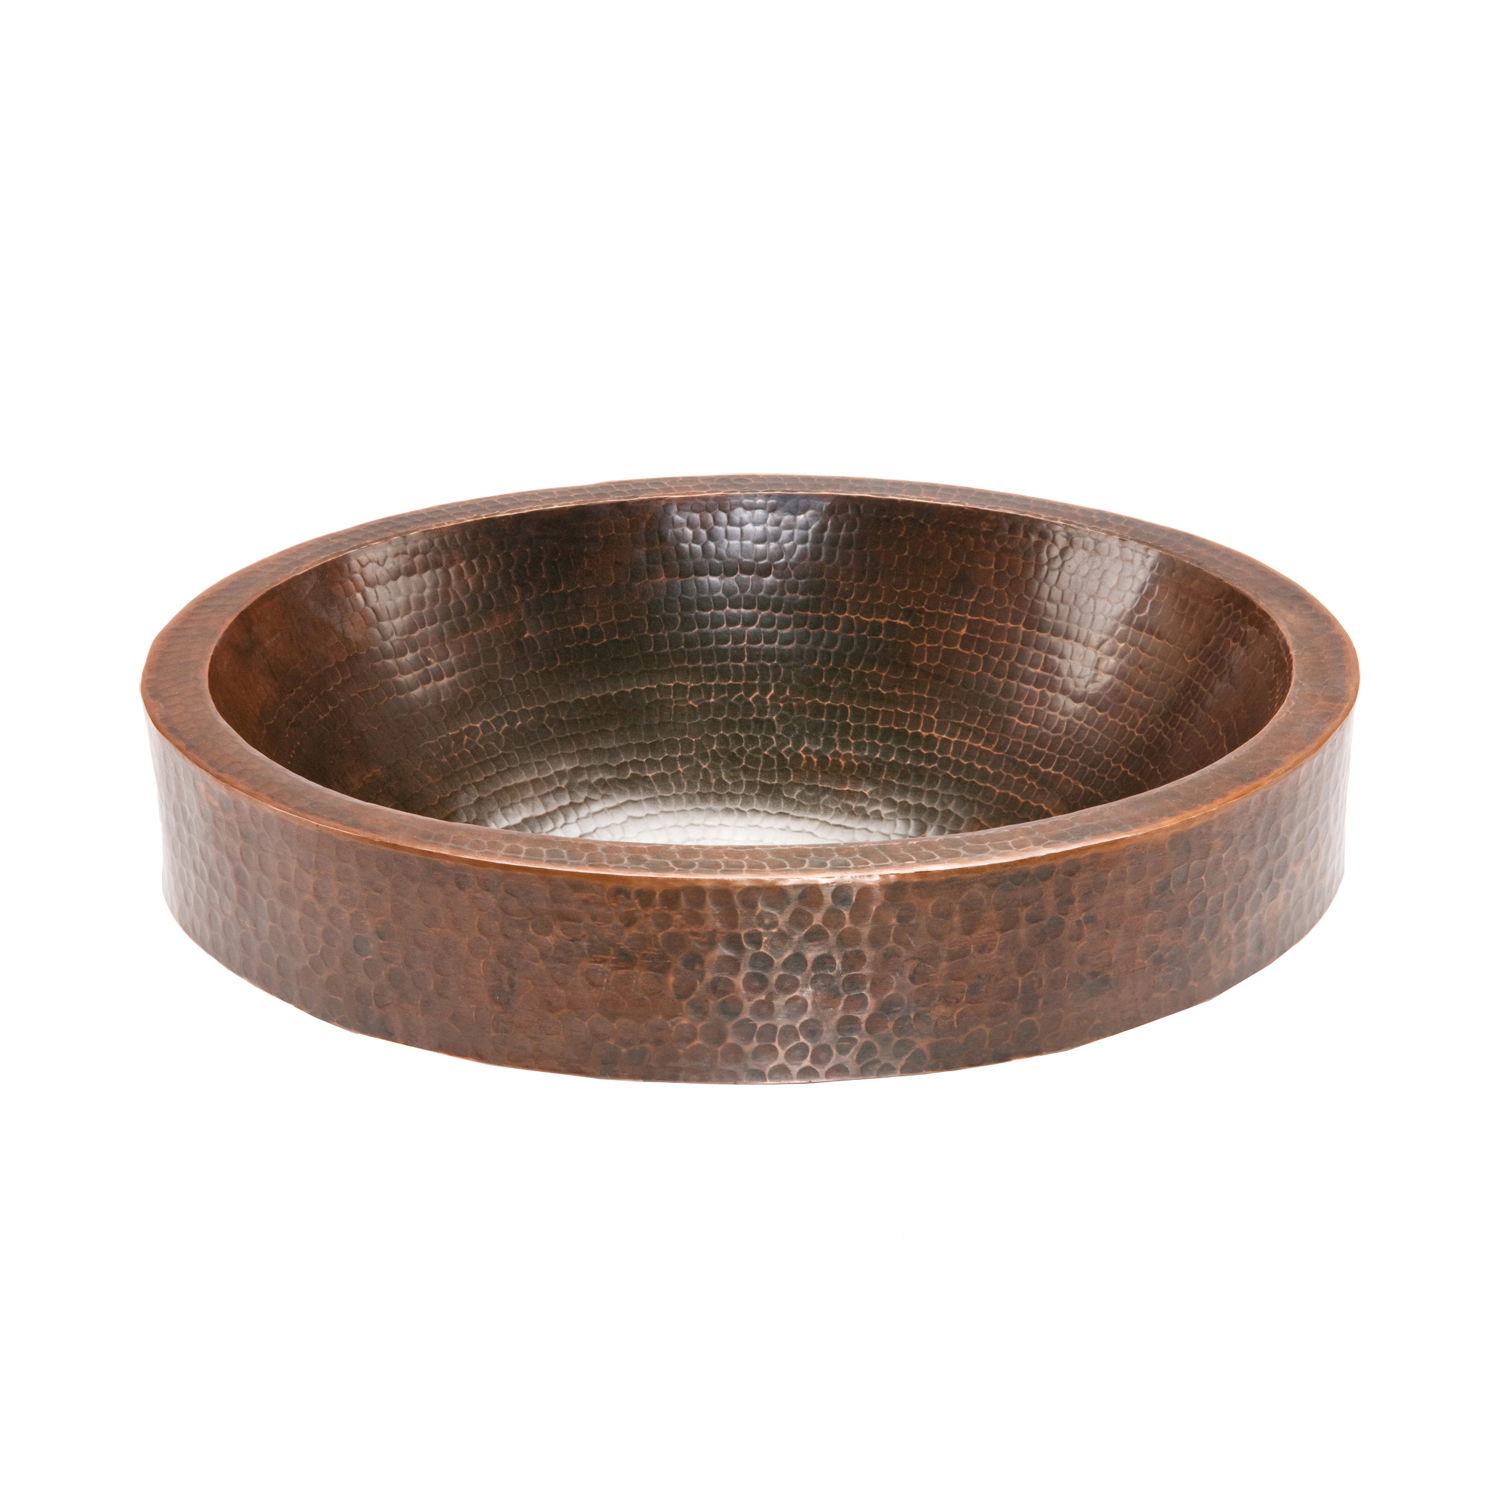 Oval Skirted Vessel Hammered Copper Sink